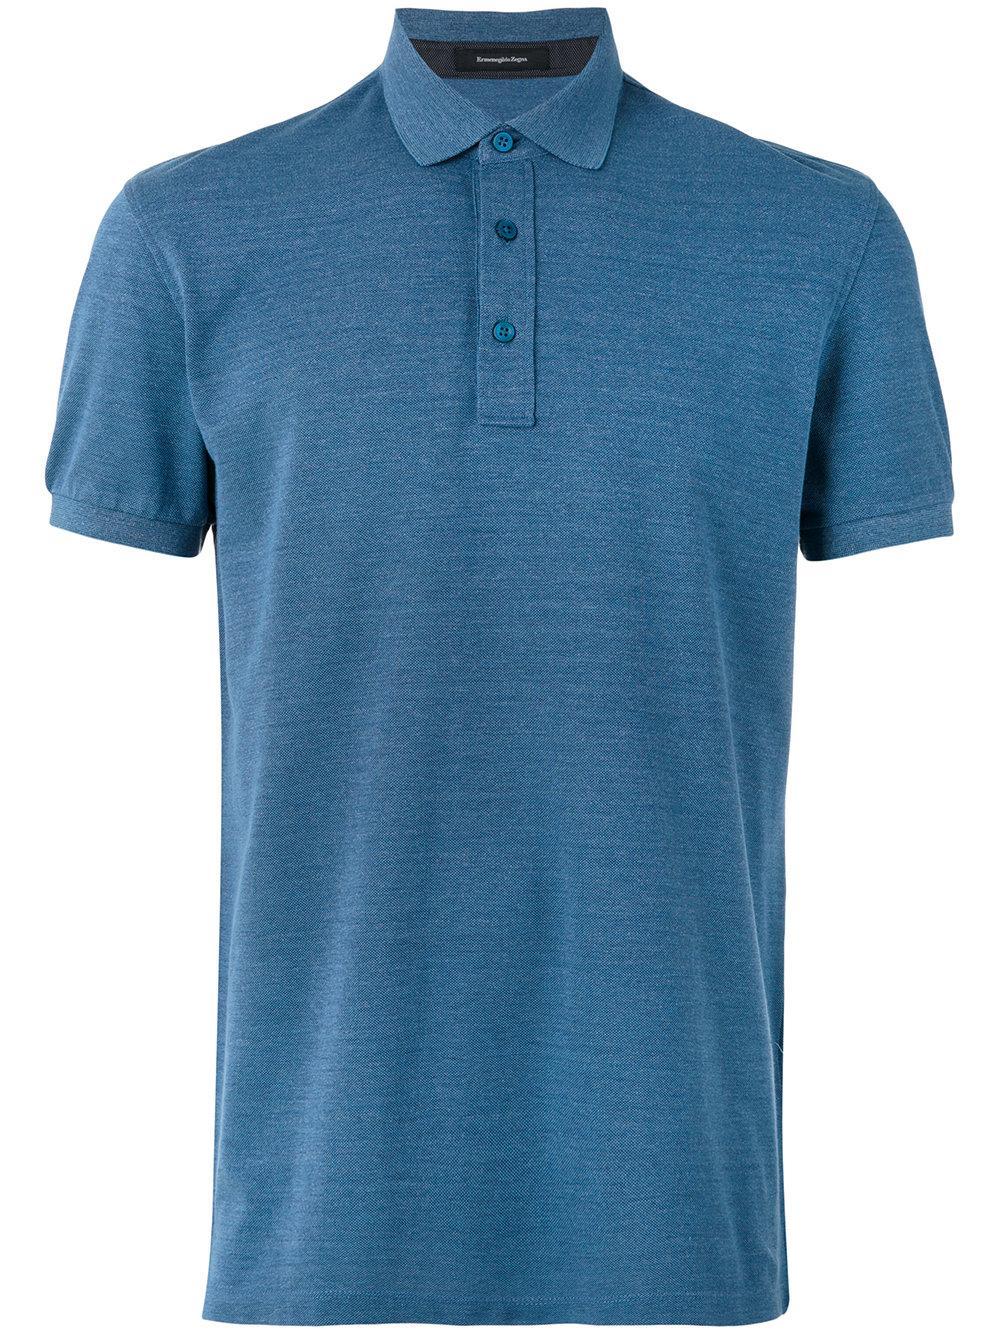 Ermenegildo zegna short sleeve polo shirt in blue for men for Zegna polo shirts sale